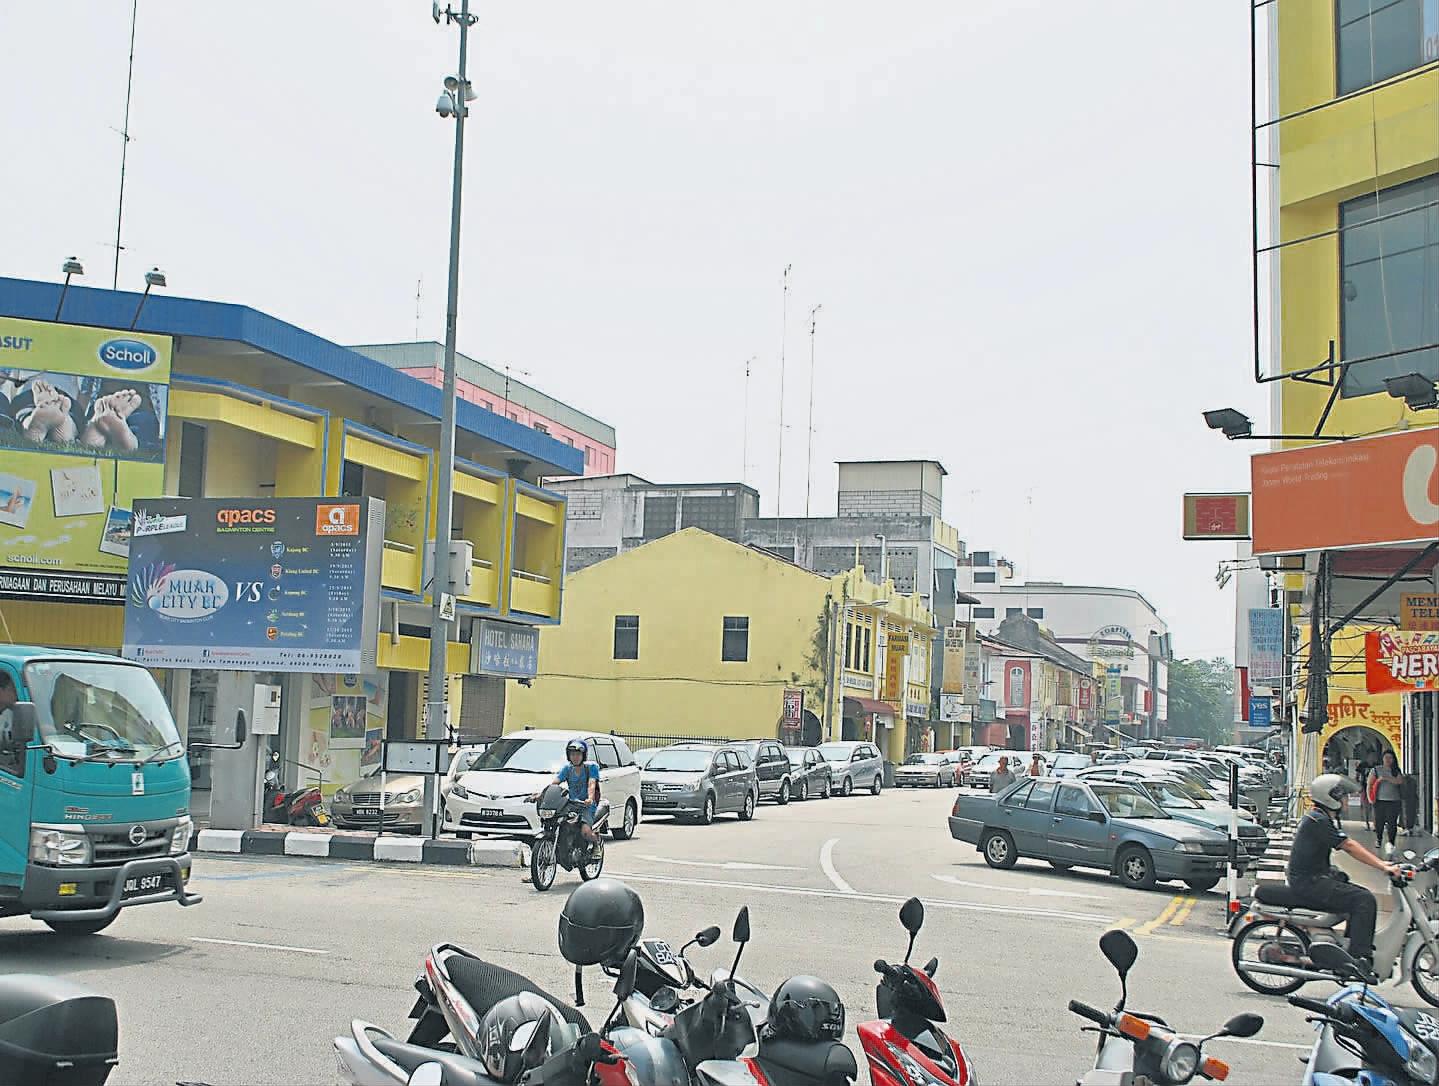 扩大范围分时段营业统一档位服装 贪食街明年新貌迎客 [Roadside hawker center in Jalan Haji Abu is expanded]